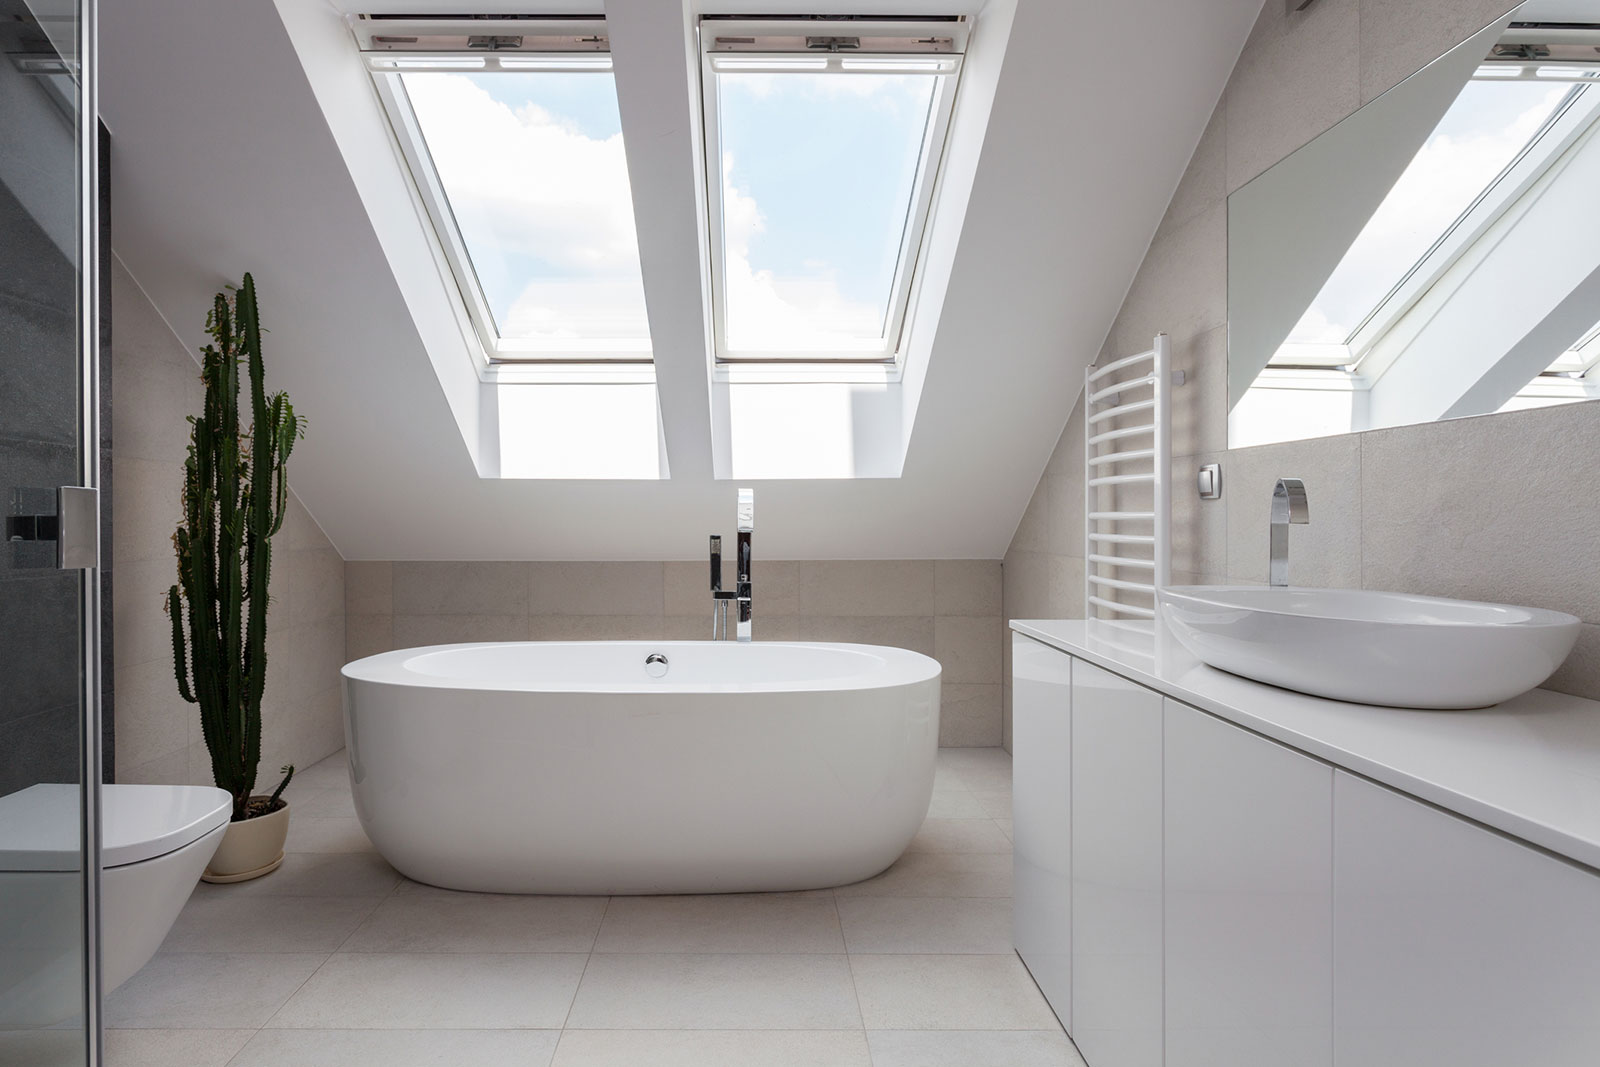 Lessen the risk with such Bathroom Tiles In Lake Villa,IL